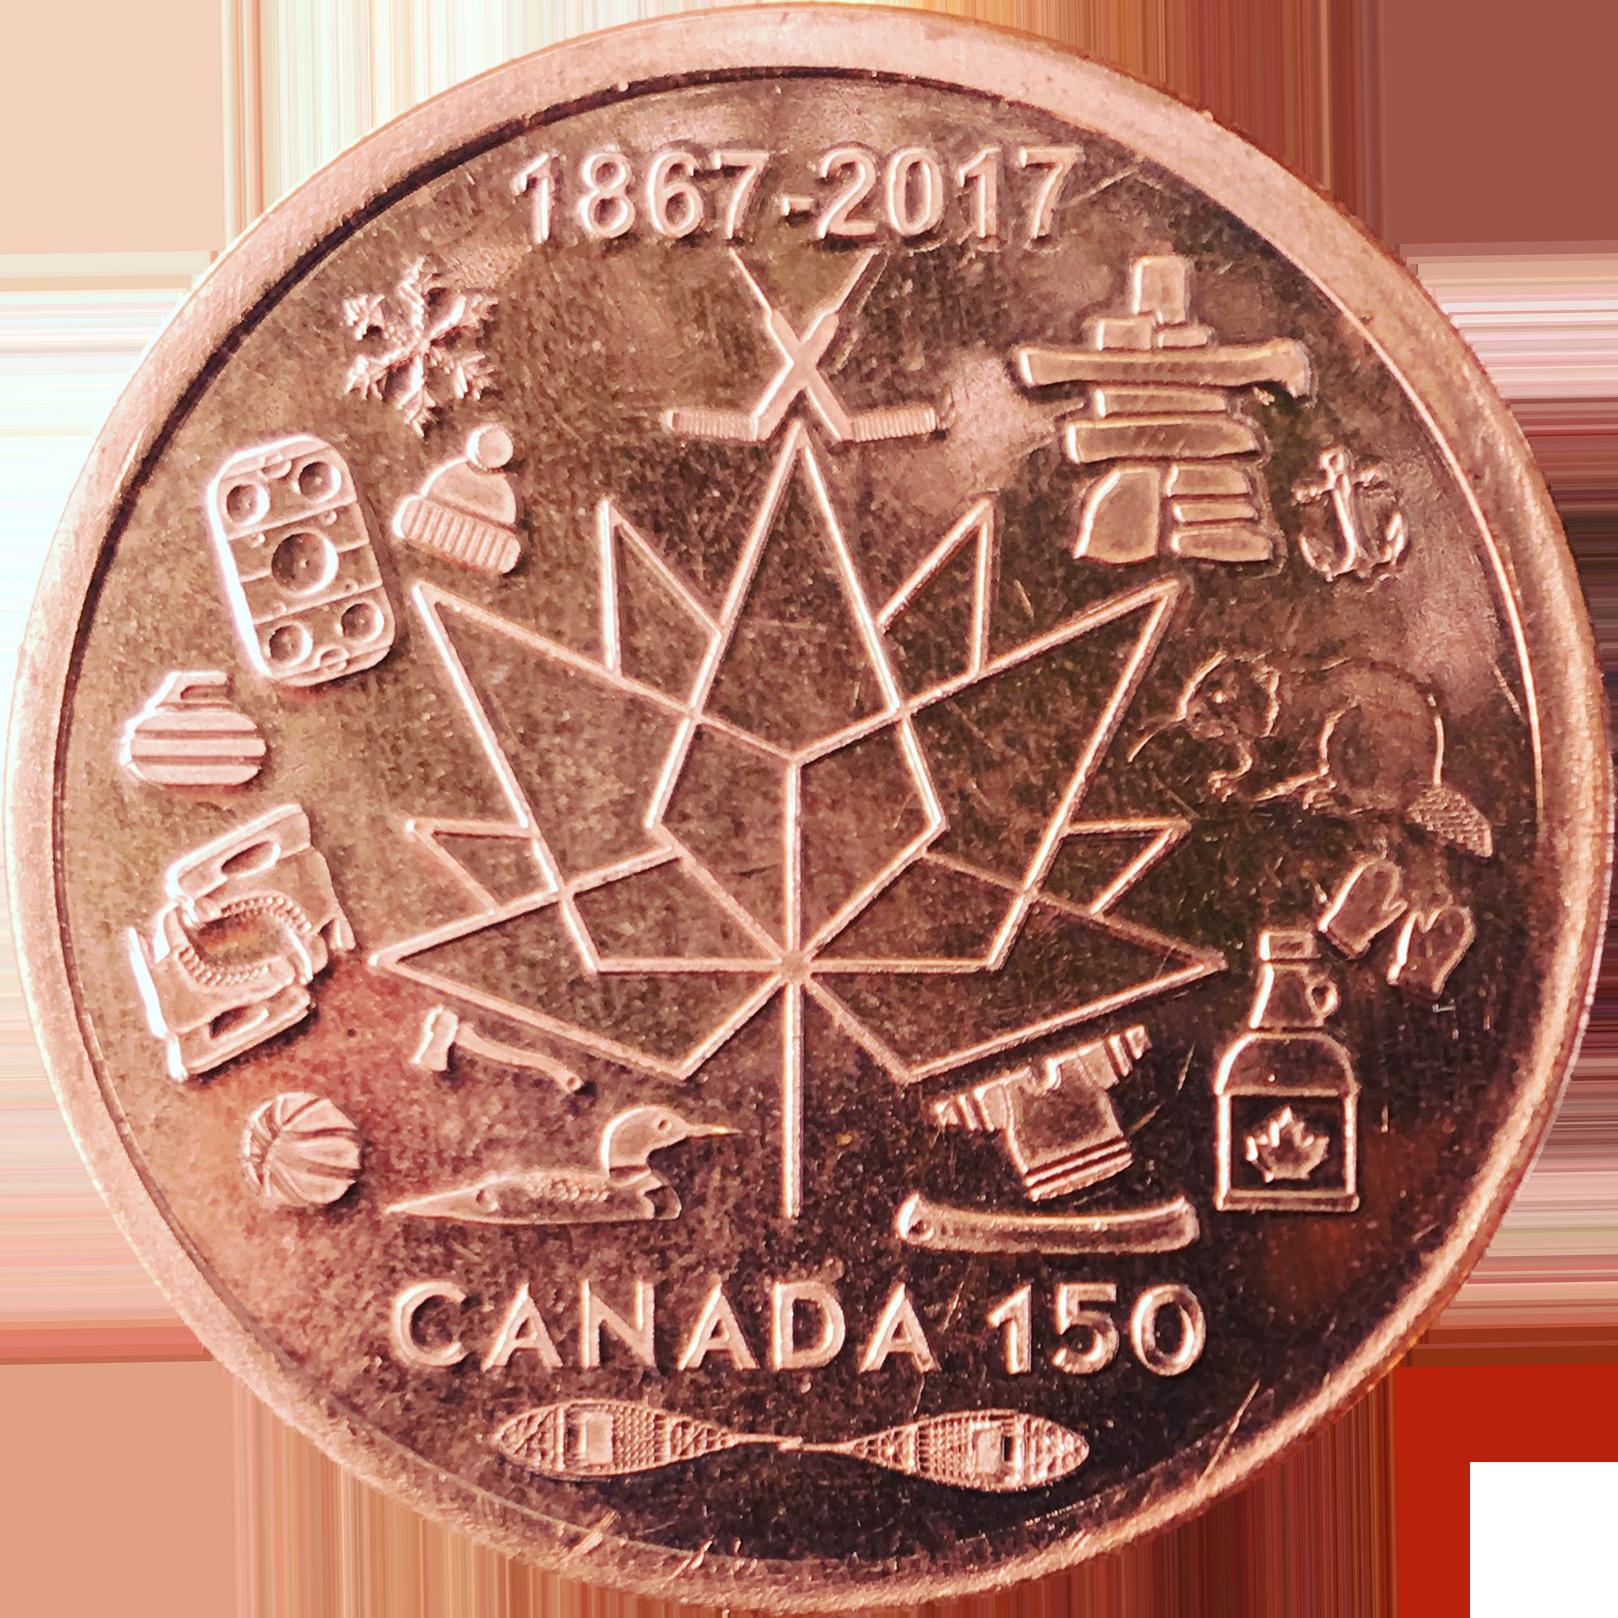 Nickel clipart canadian nickel. Canada commemorative hand made